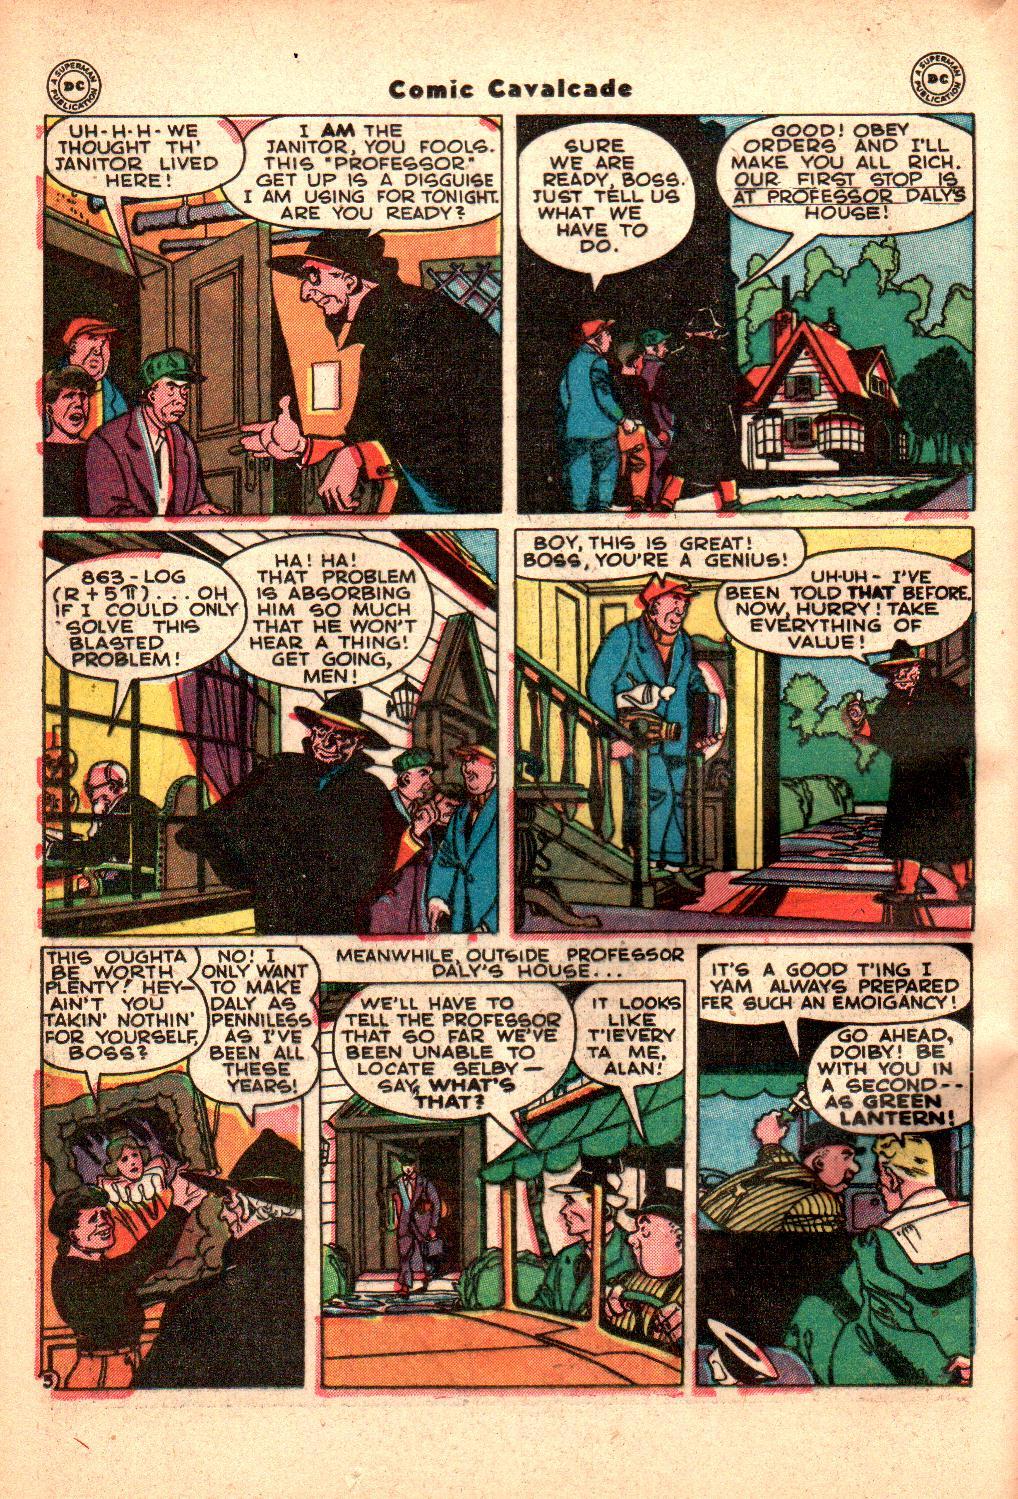 Comic Cavalcade issue 21 - Page 66